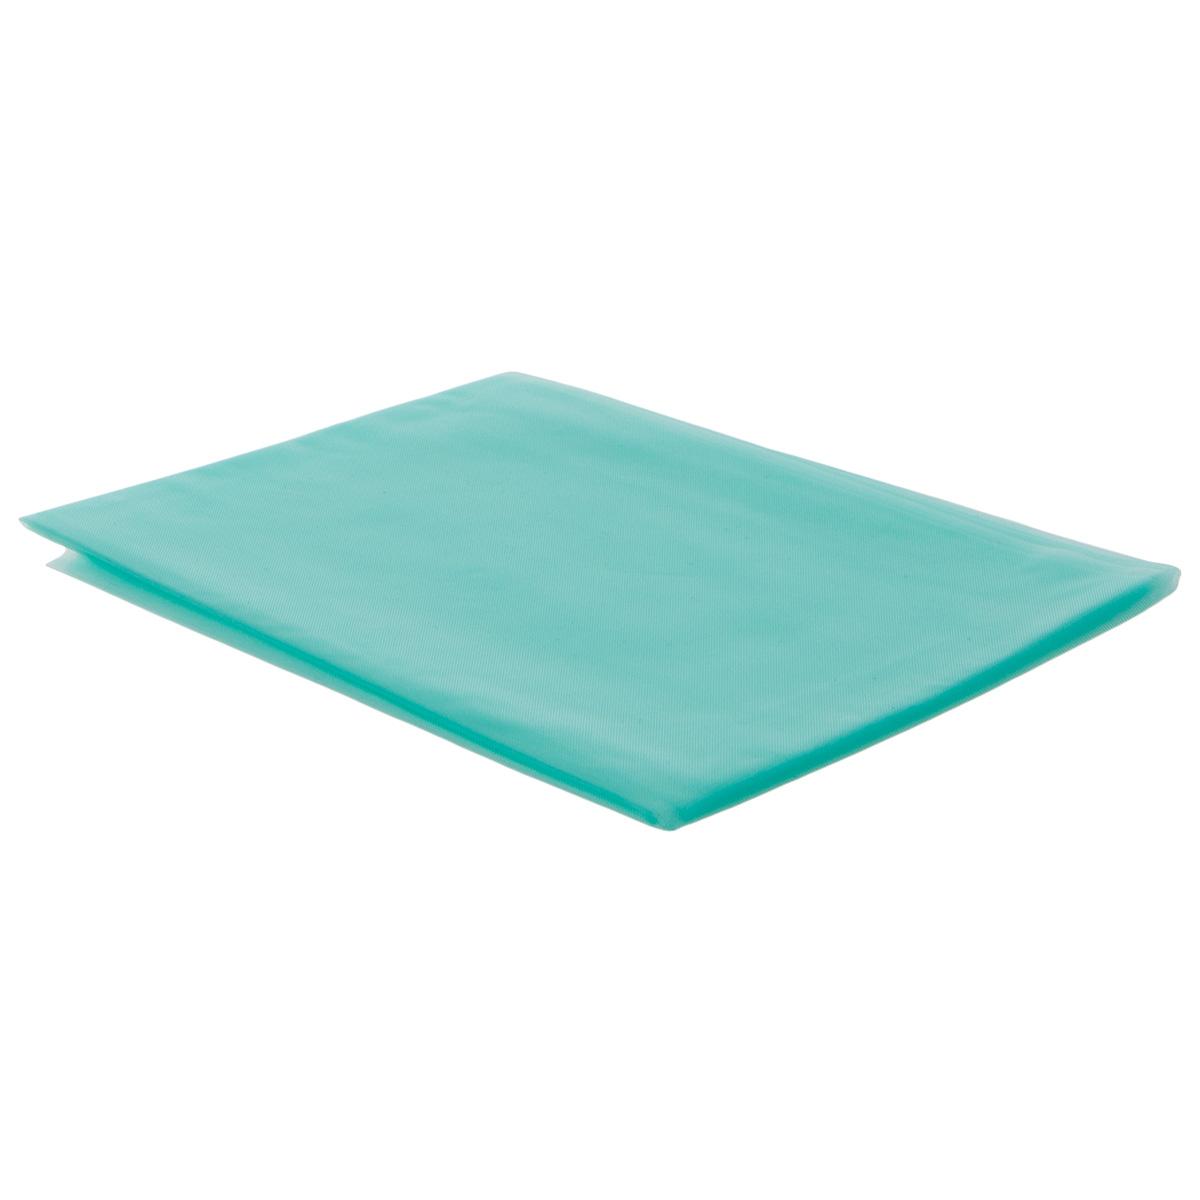 drape section sterile disposable product drapes surgical china tmxqwzolldaj caesarean